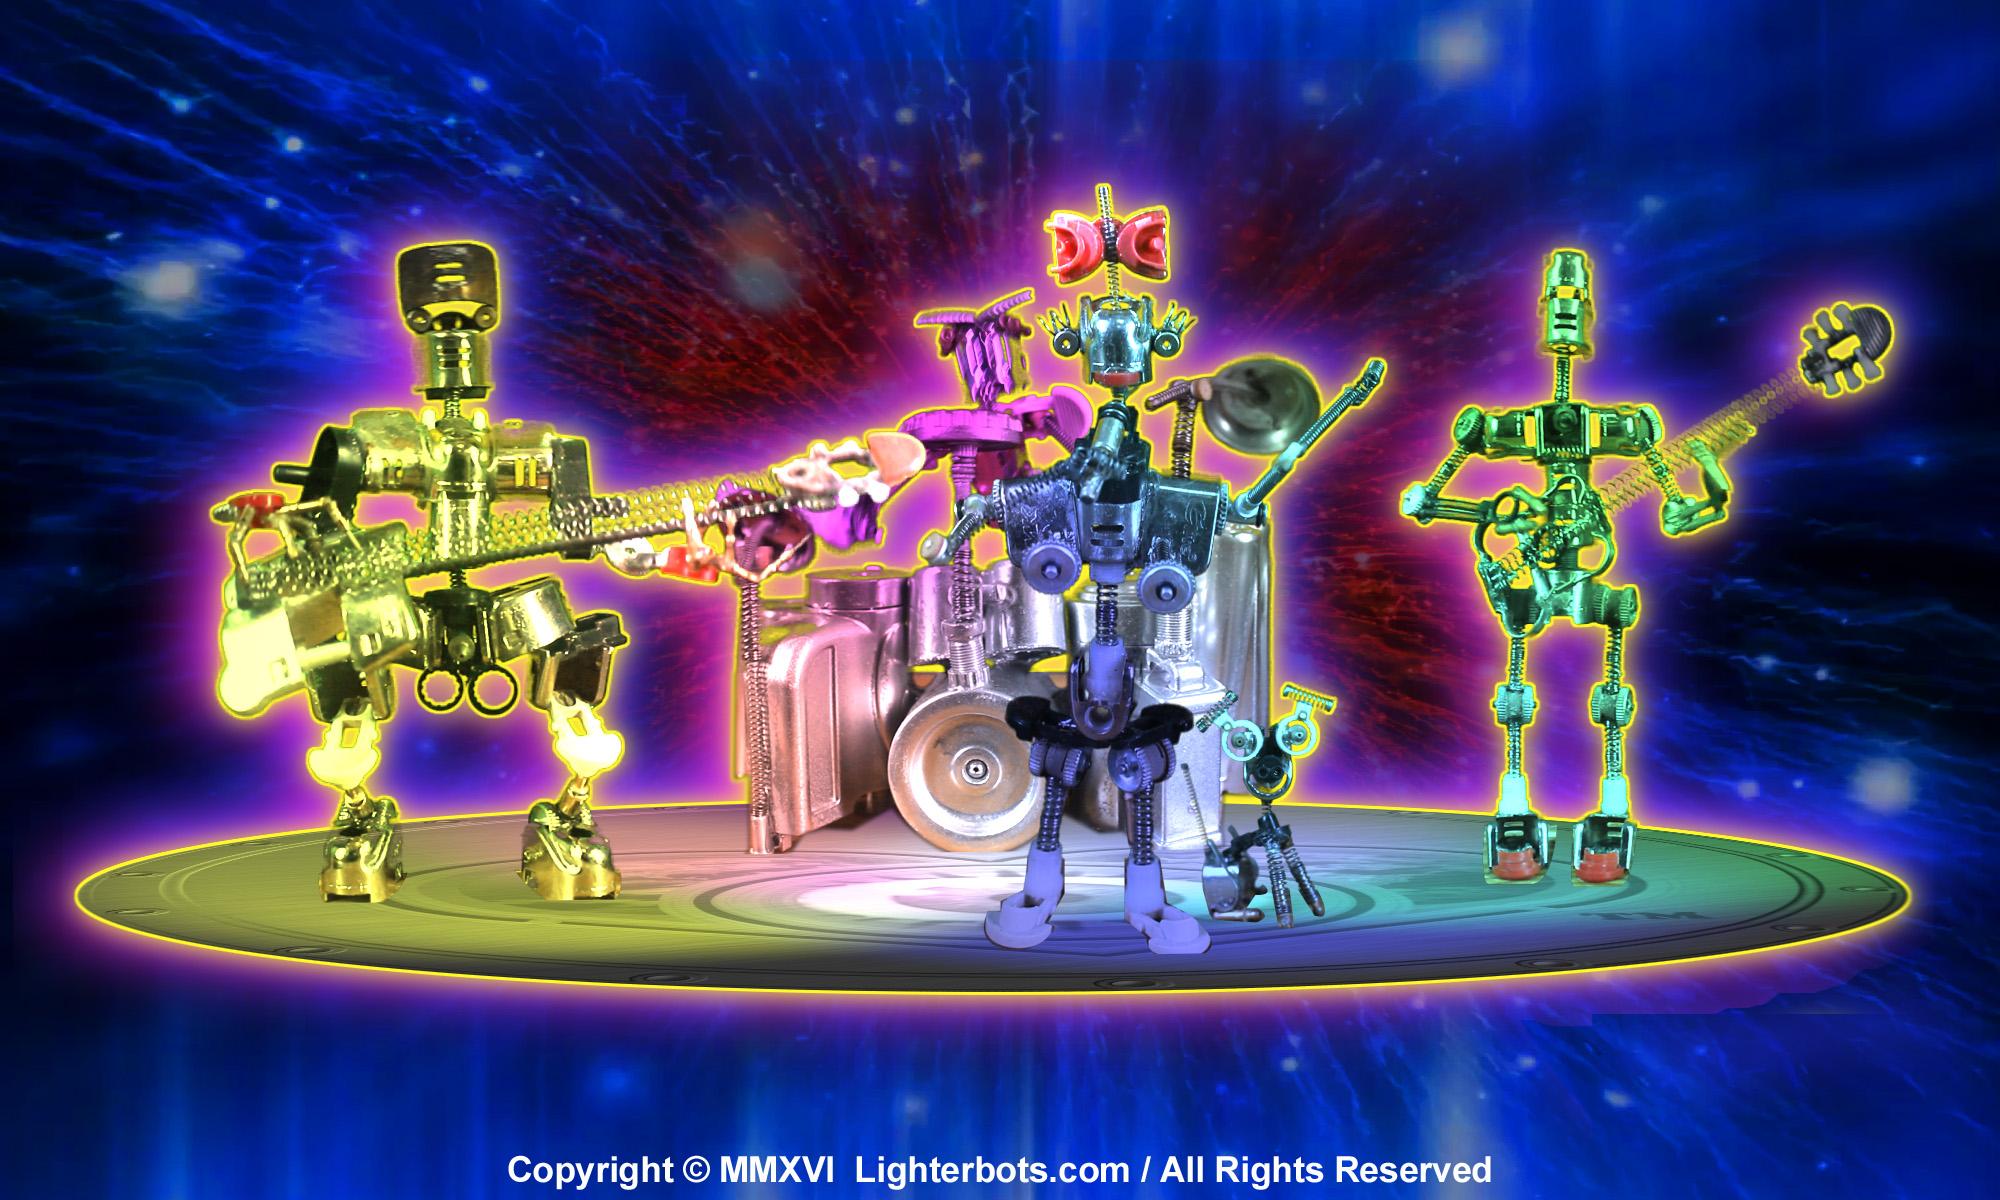 Lighterbots